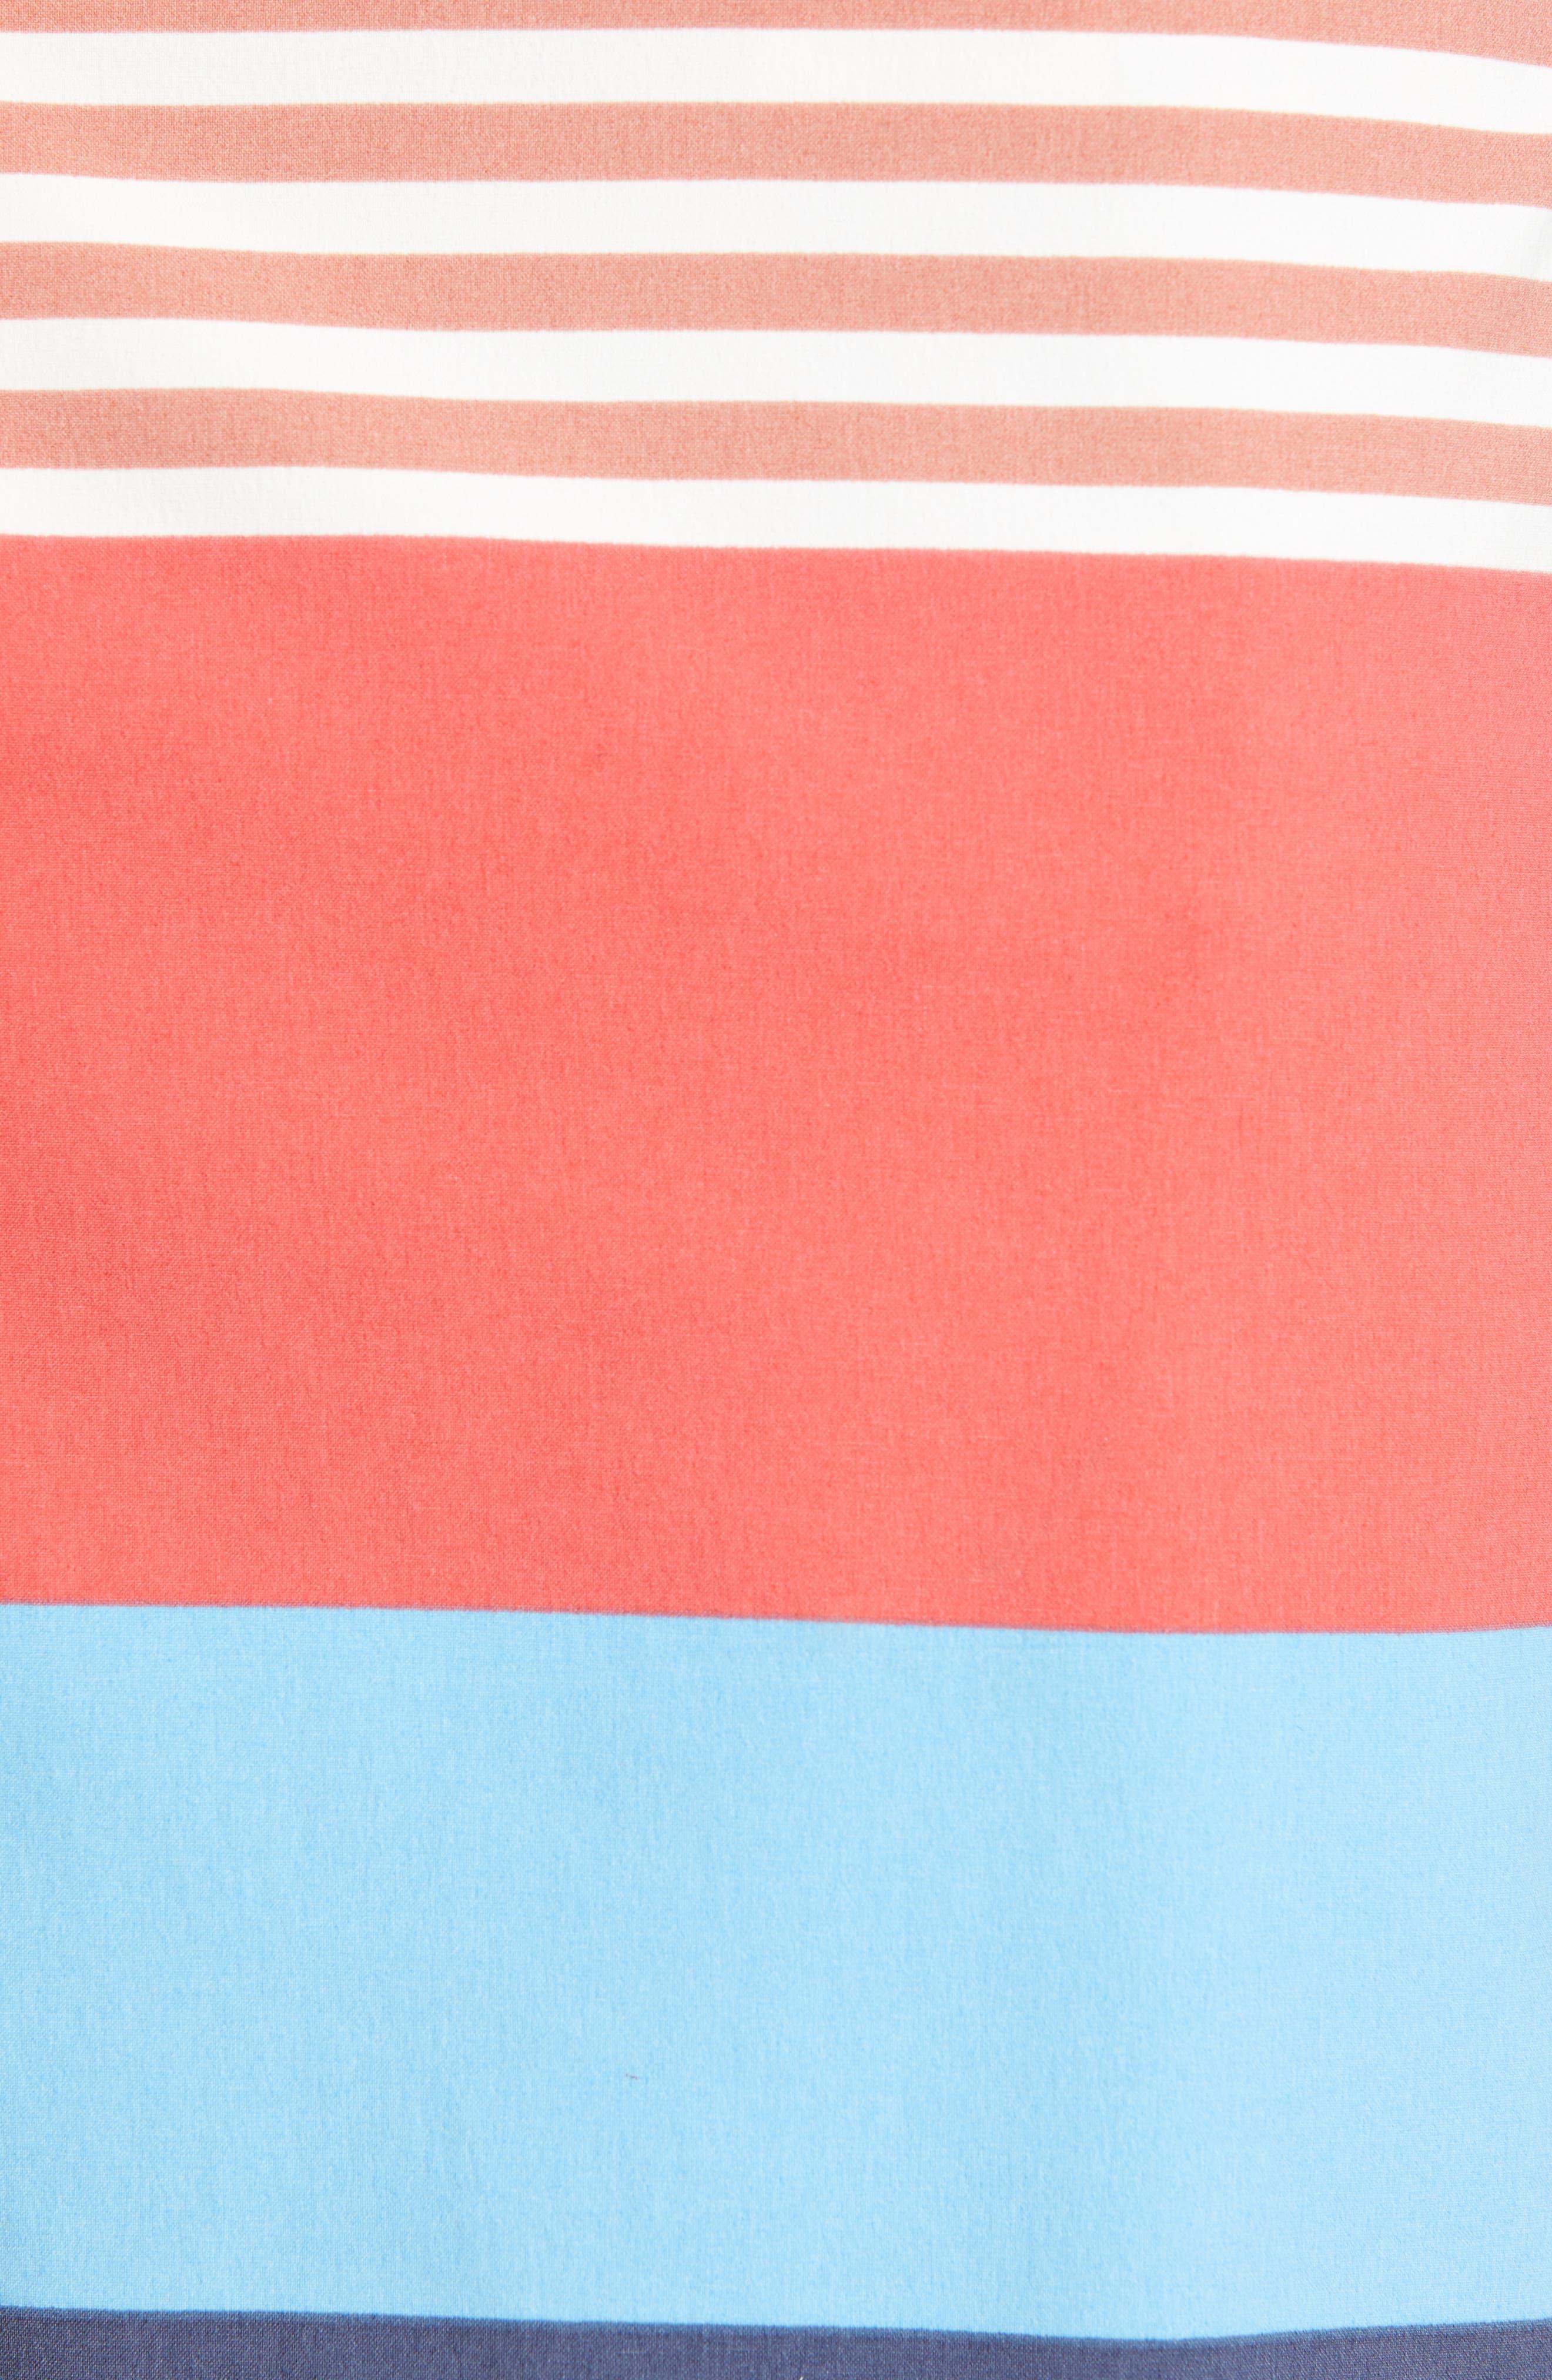 PATAGONIA,                             Wavefarer Board Shorts,                             Alternate thumbnail 5, color,                             FITZ STRIPE: SPICED CORAL